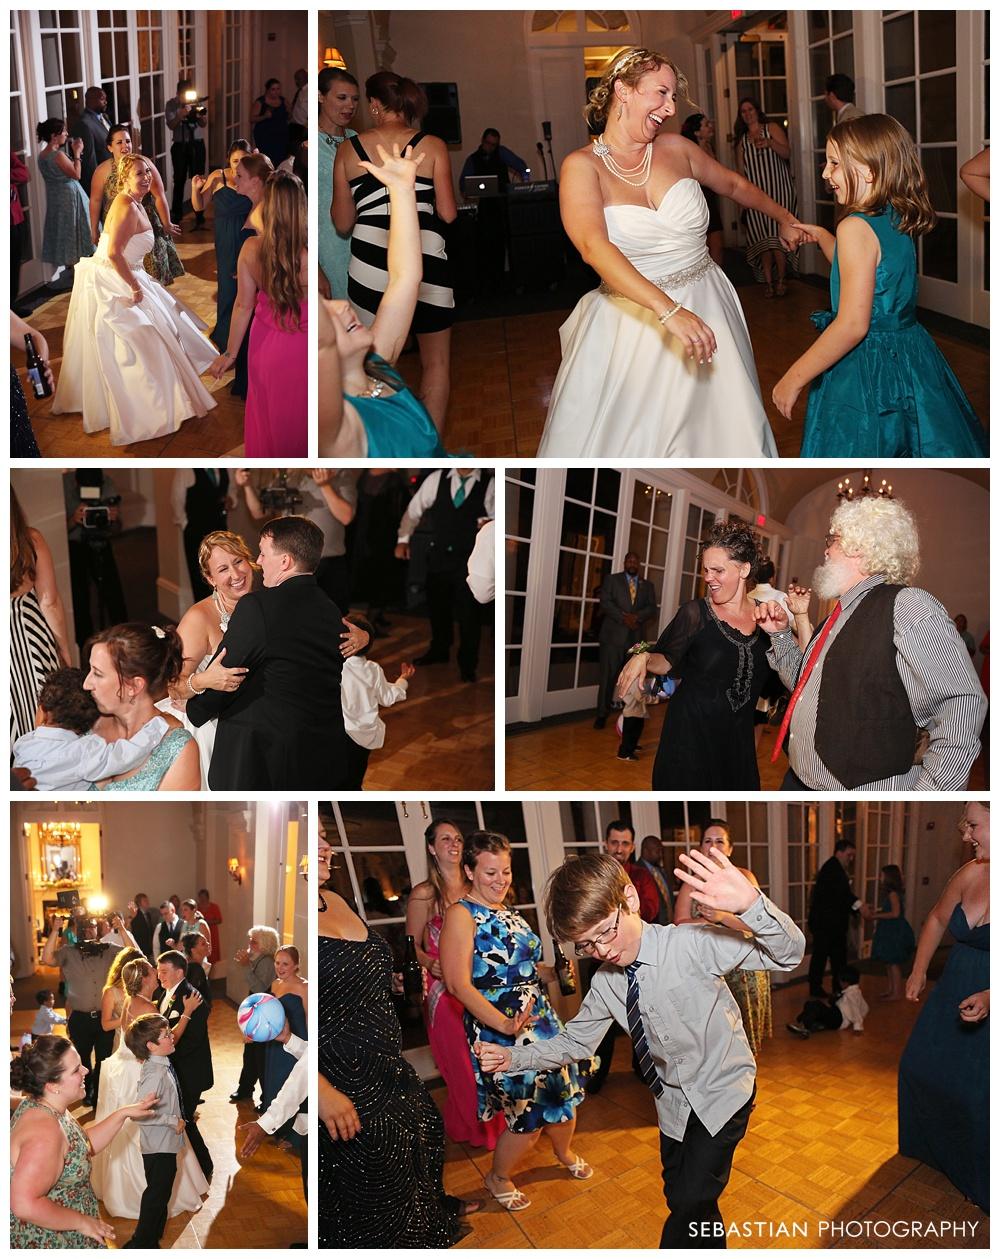 Sebastian_Photography_Wadsworth_Mansion_Wedding_Pictures_CT_56.jpg